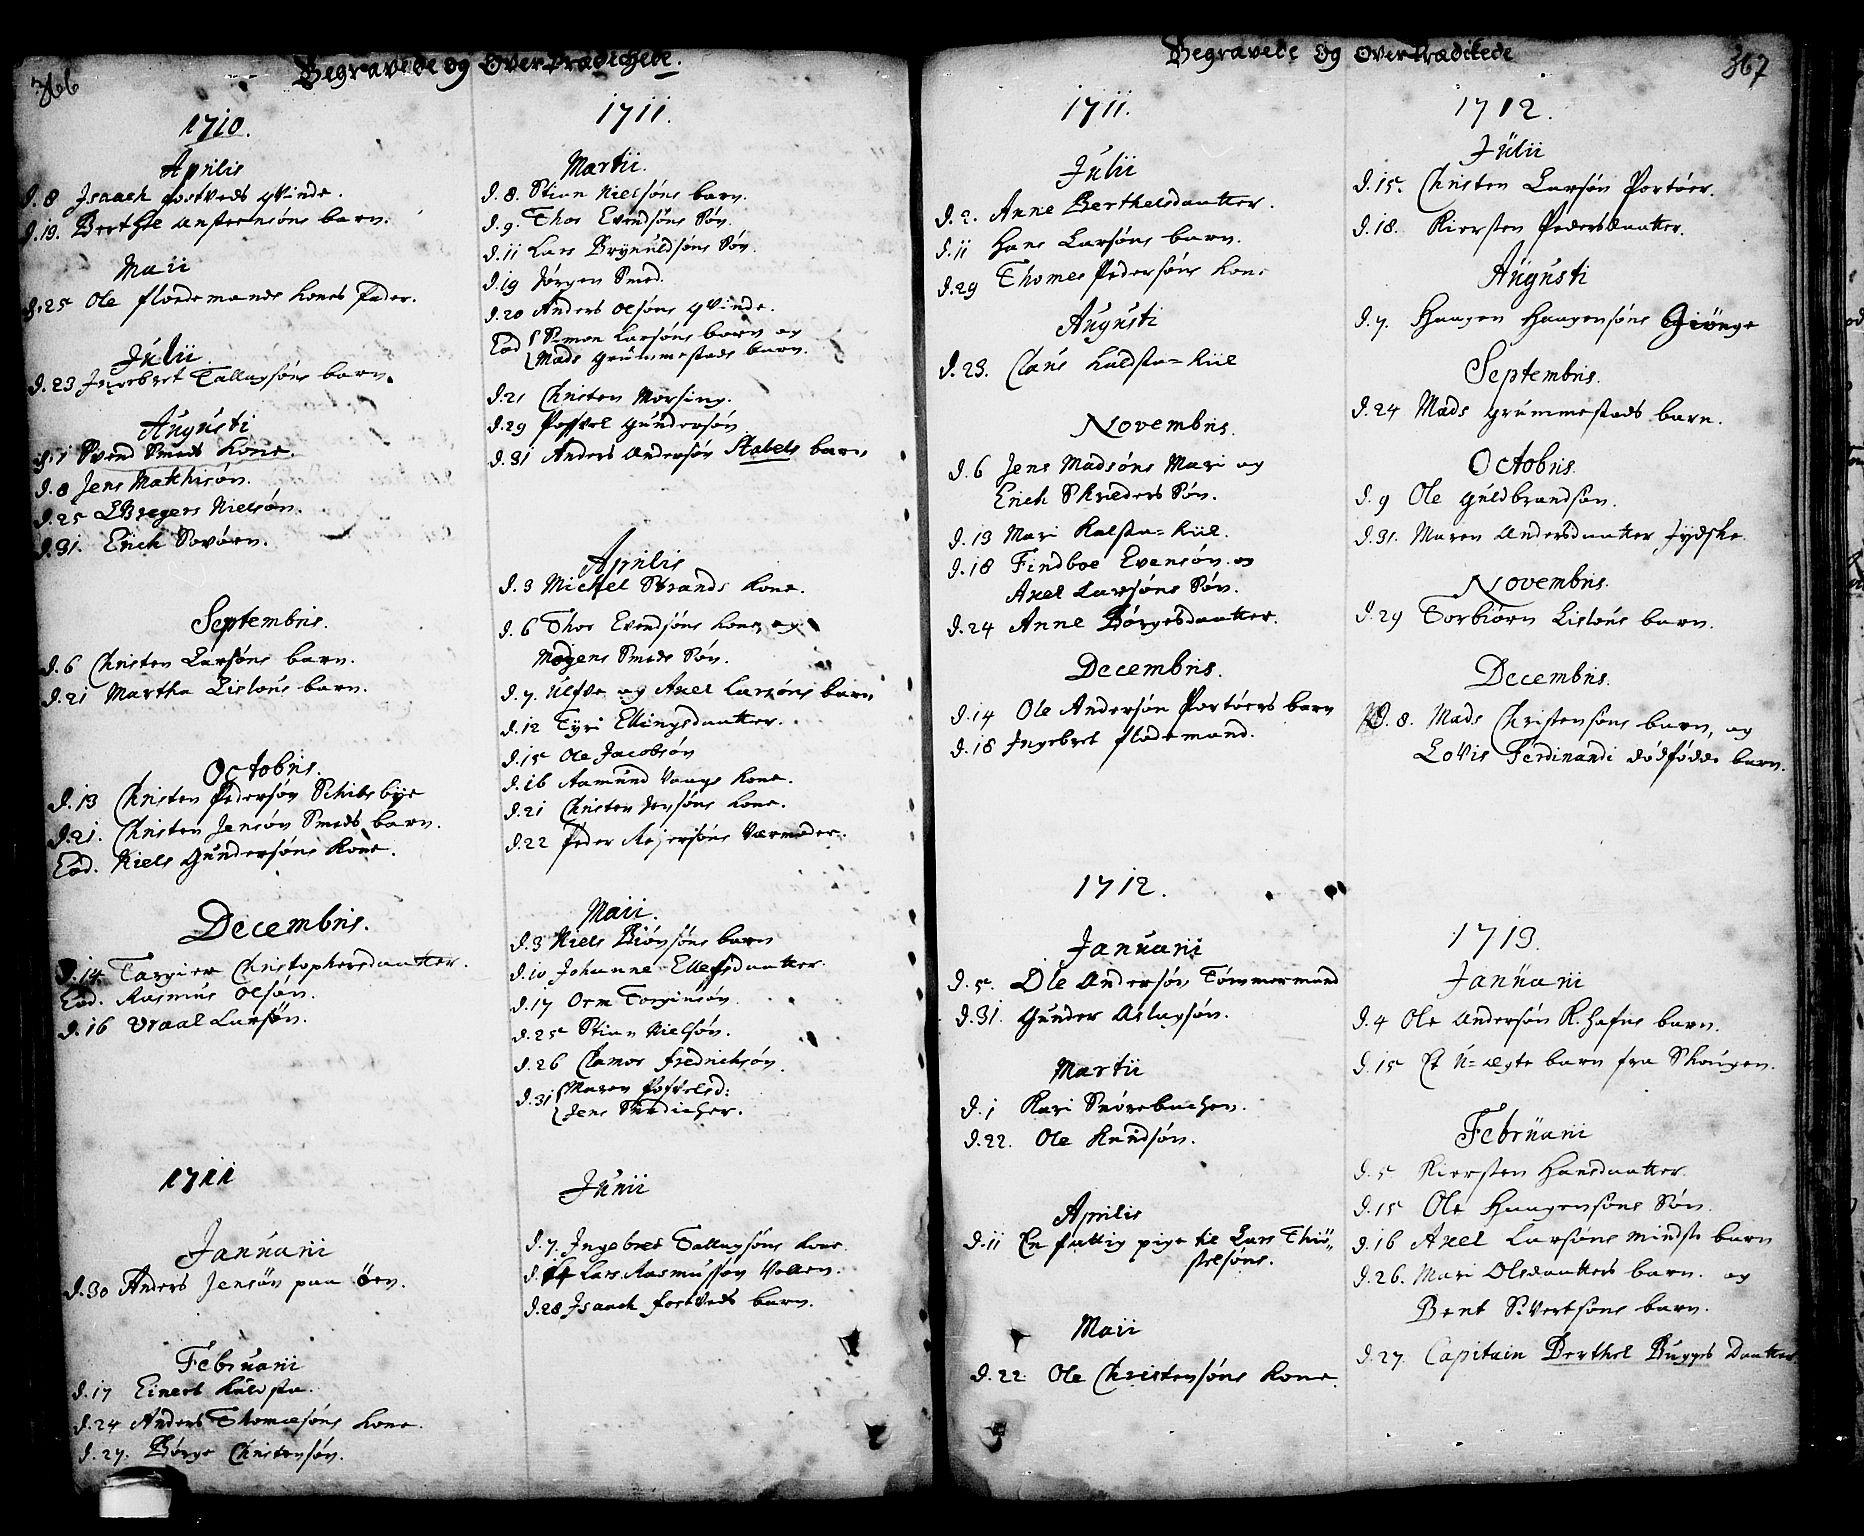 SAKO, Kragerø kirkebøker, F/Fa/L0001: Ministerialbok nr. 1, 1702-1766, s. 366-367